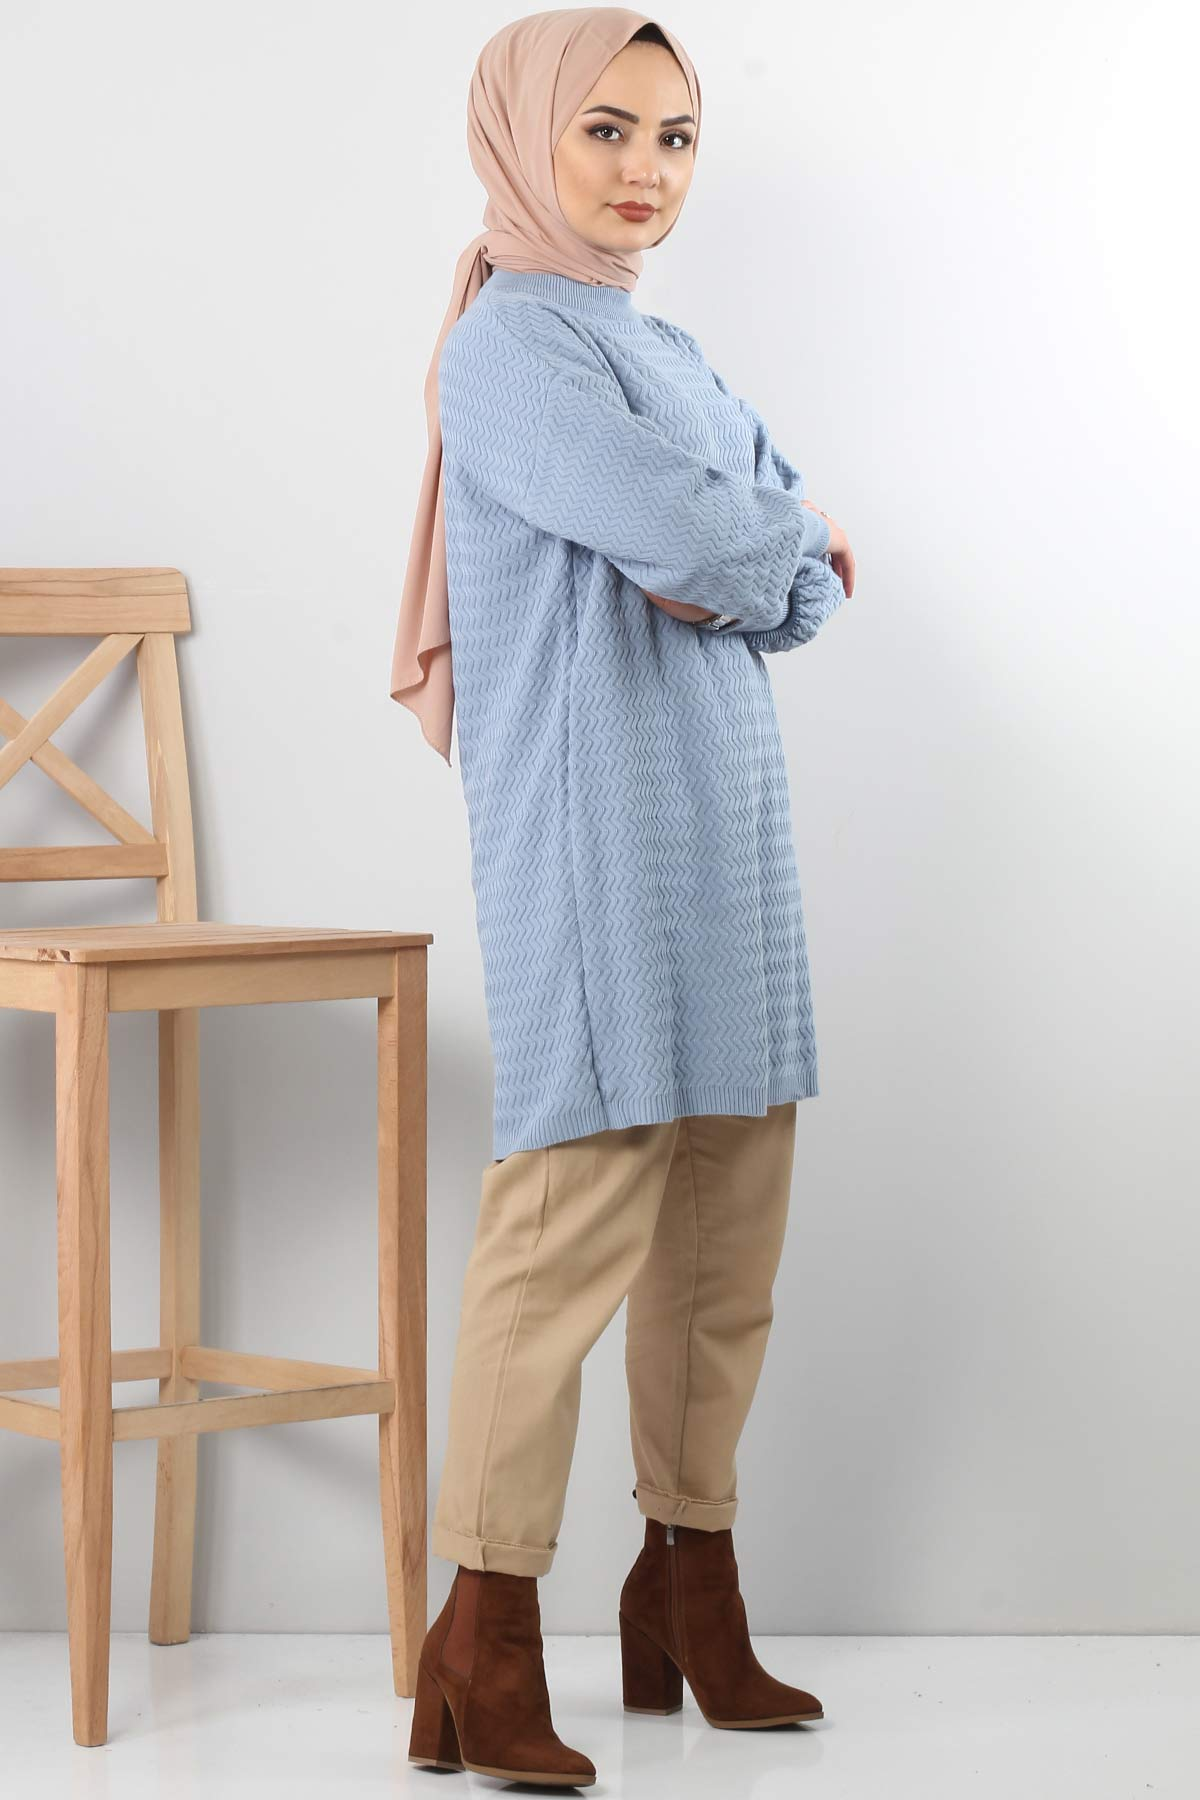 Zikzak Desenli Triko Tunik TSD5180 Bebe Mavisi